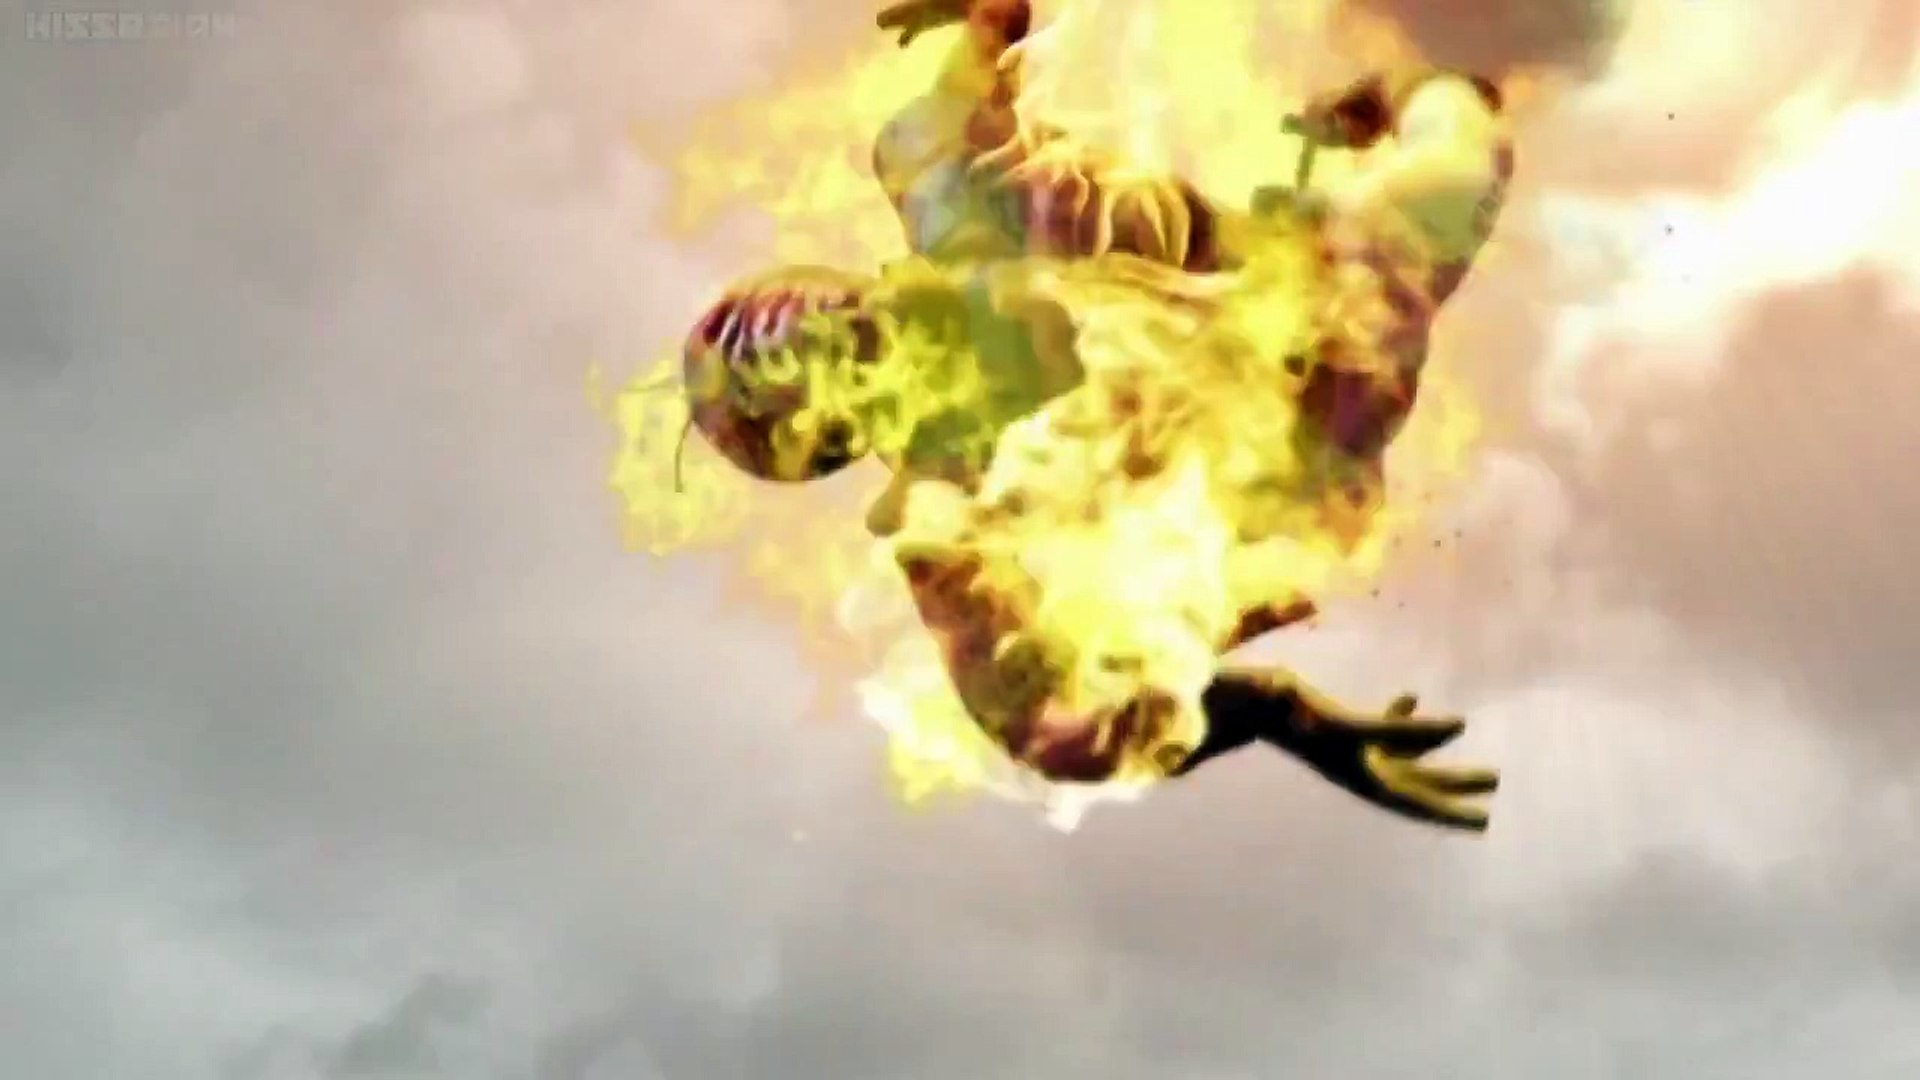 Kamen Rider Decade Kills Skyrider, Super 1, and Kabuto